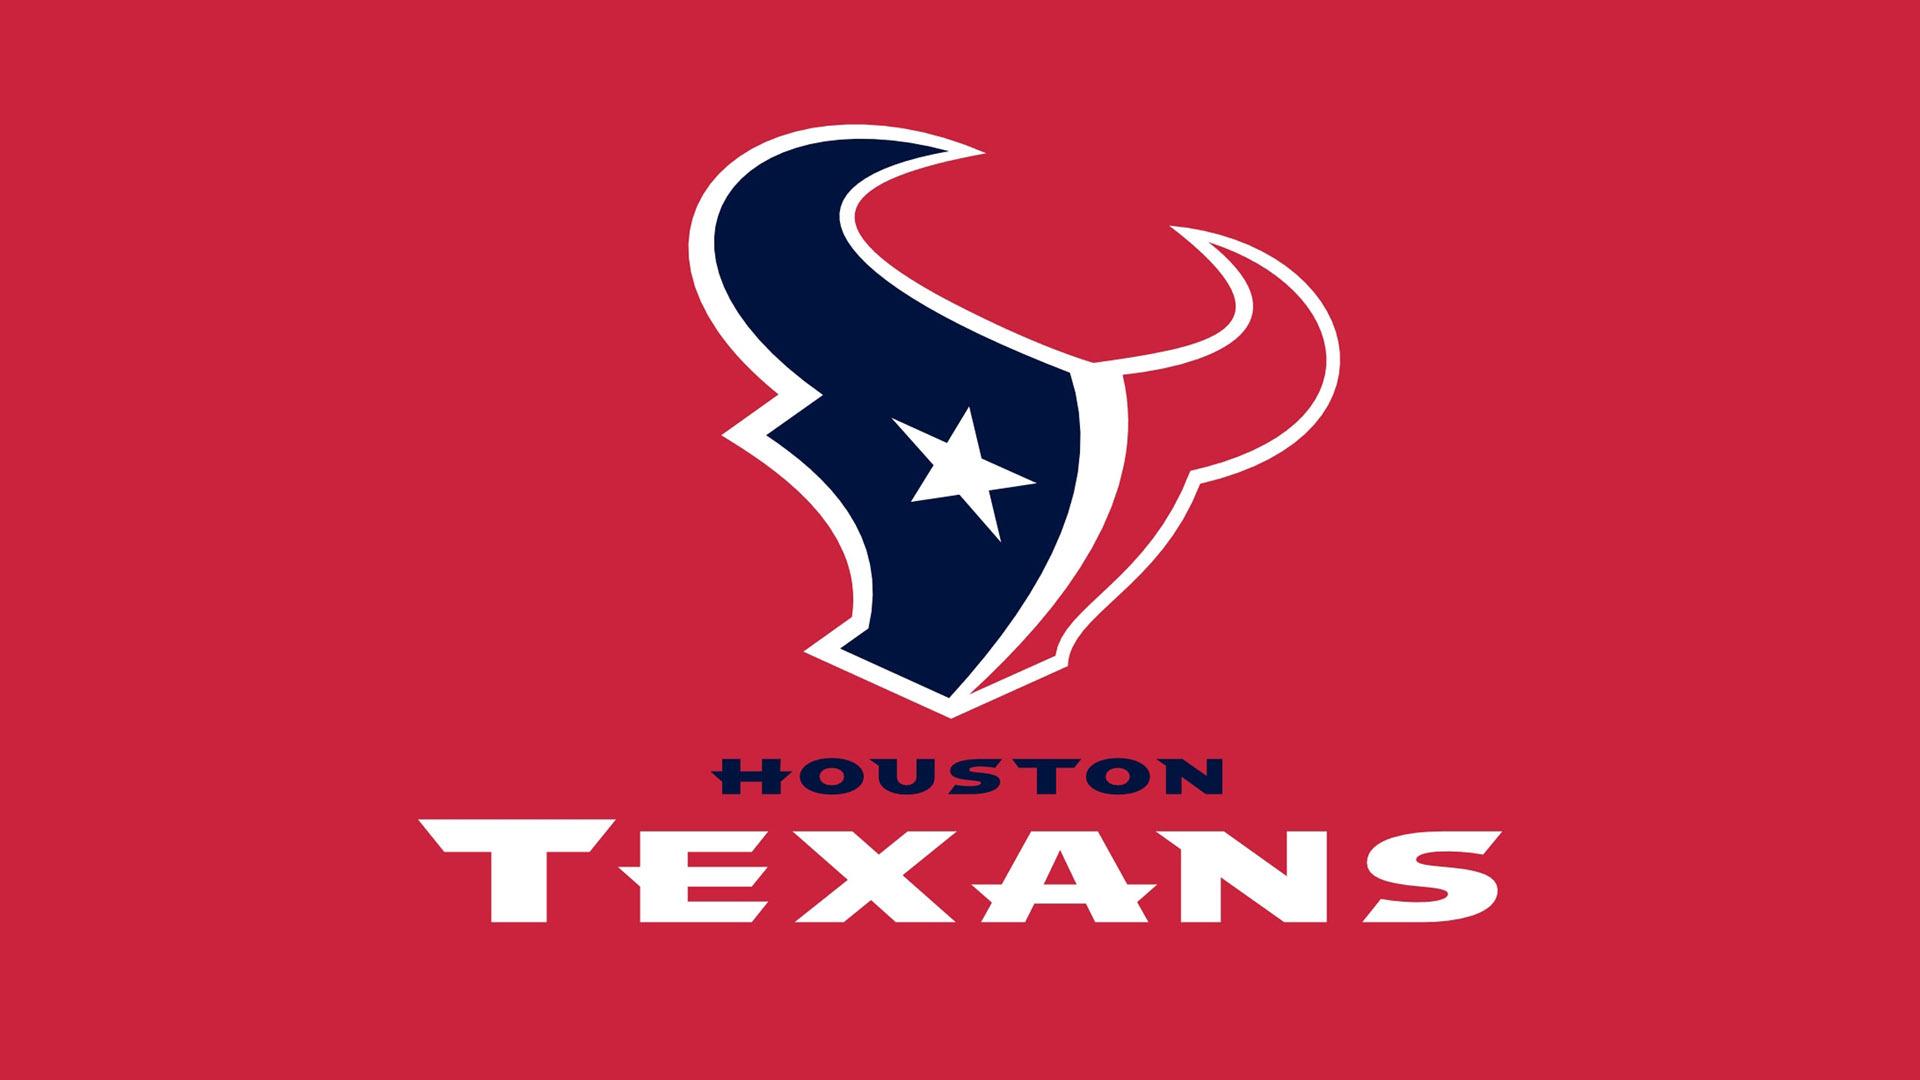 Houston Texans Hd Background